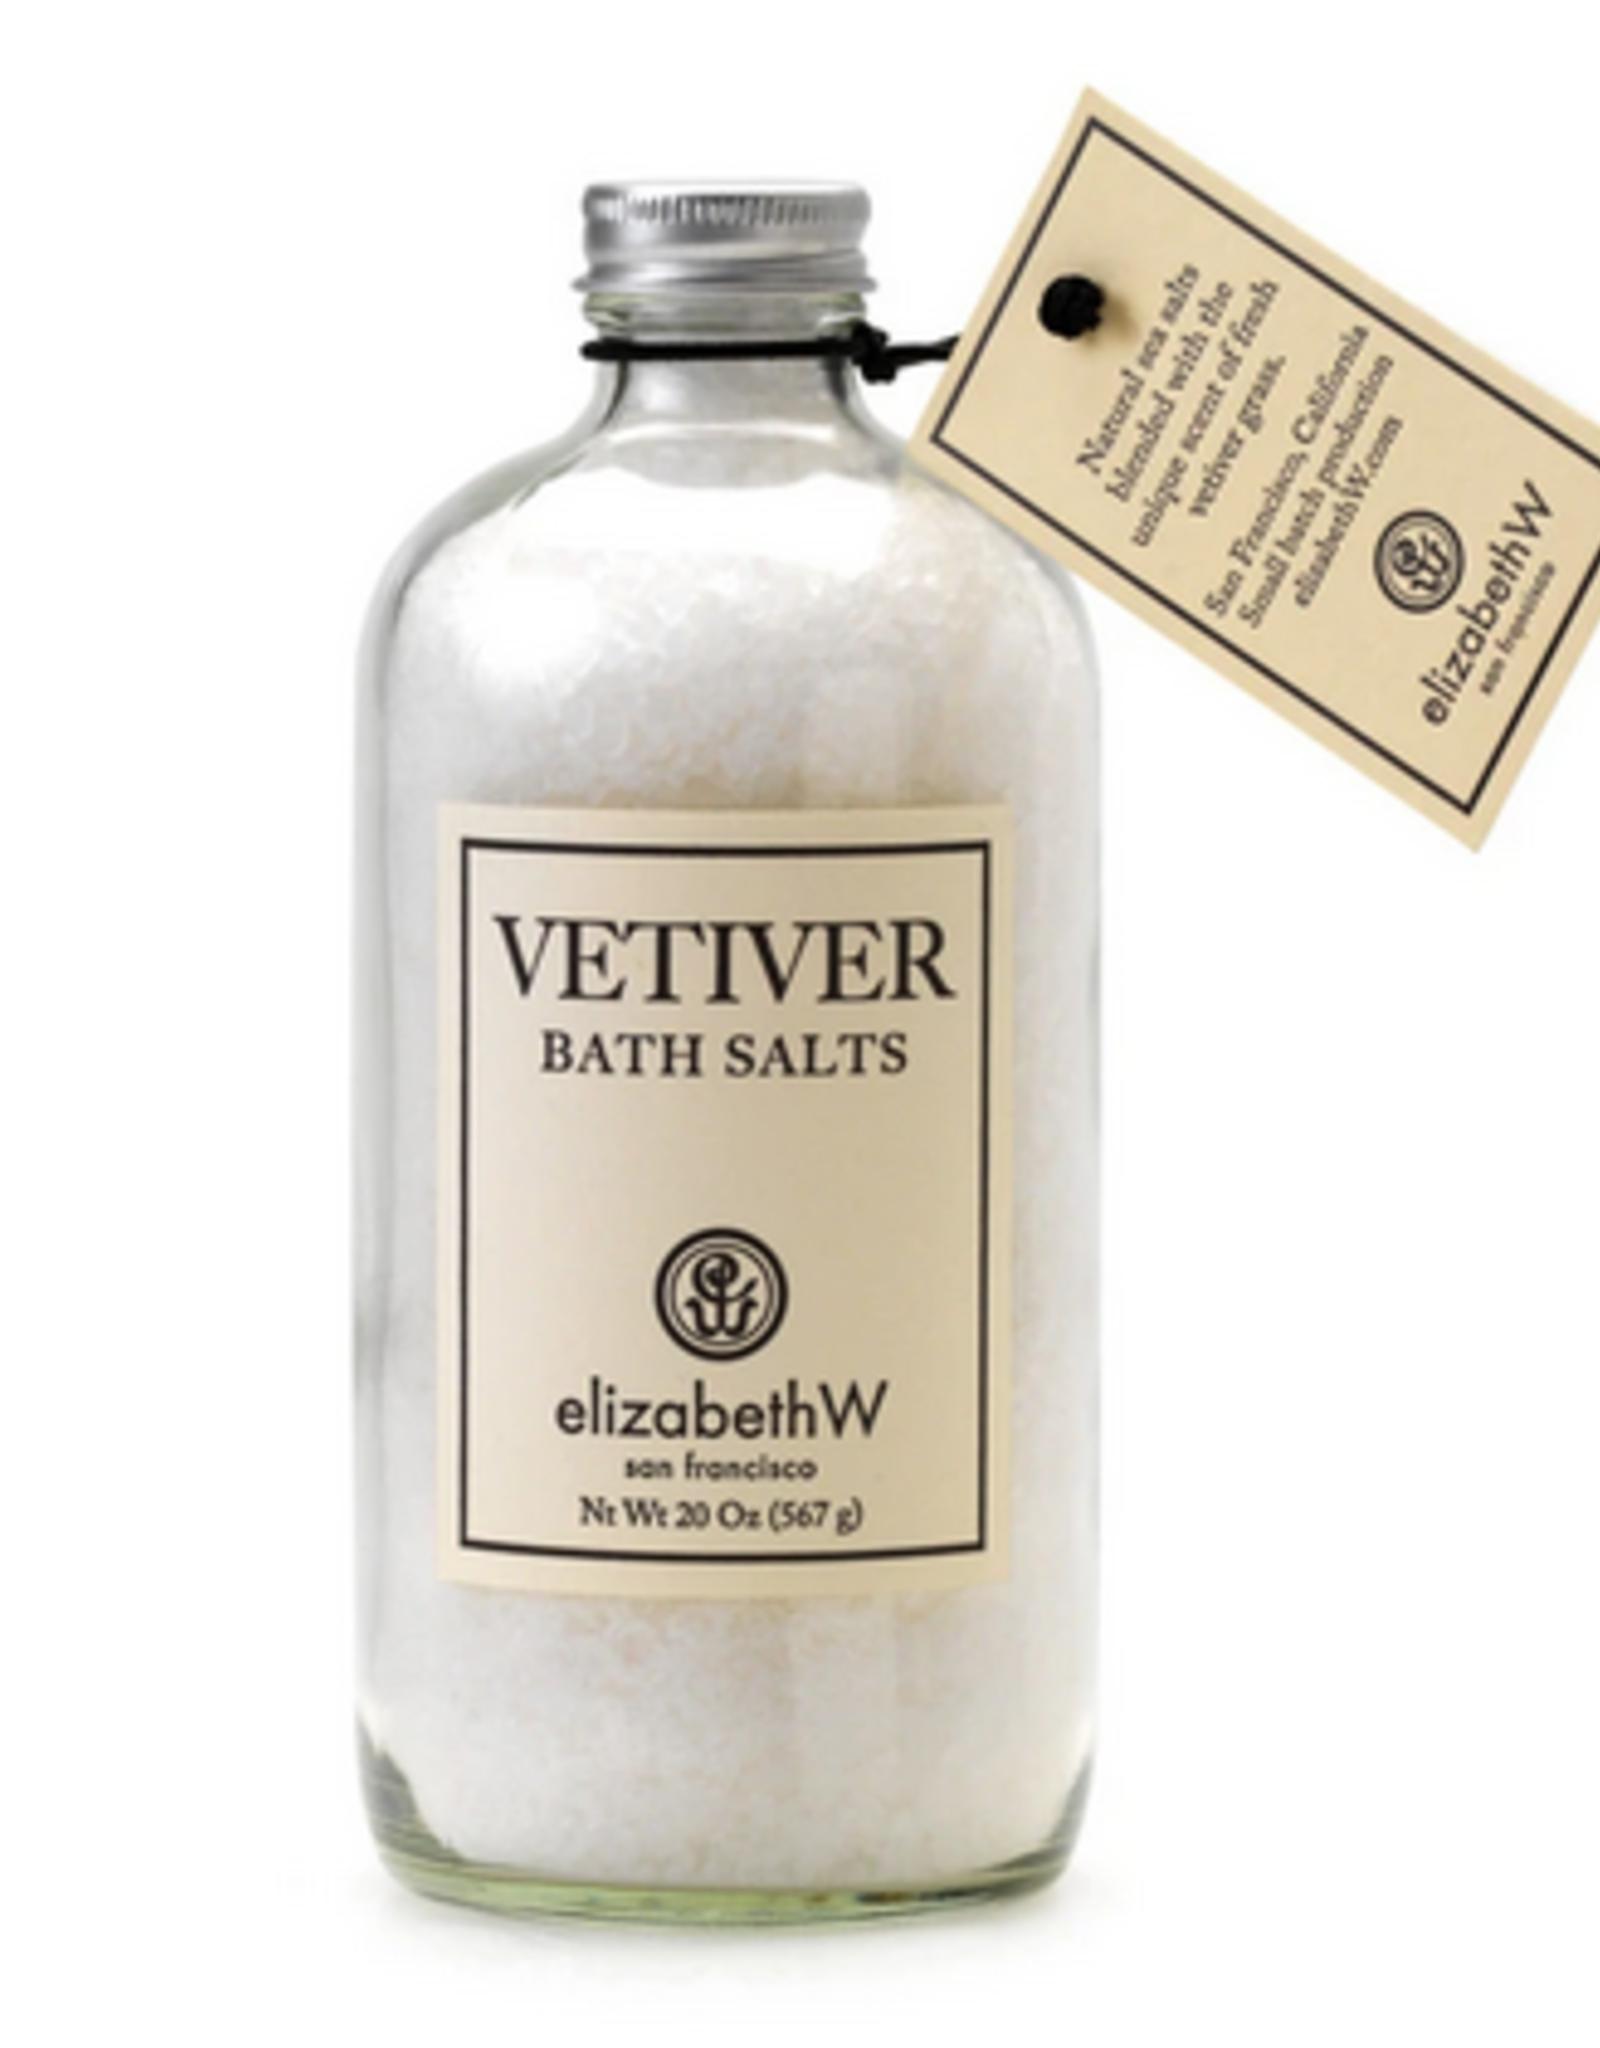 ELIZABETH W BATH SALTS IN GLASS BOTTLE 20 OZ VETIVER